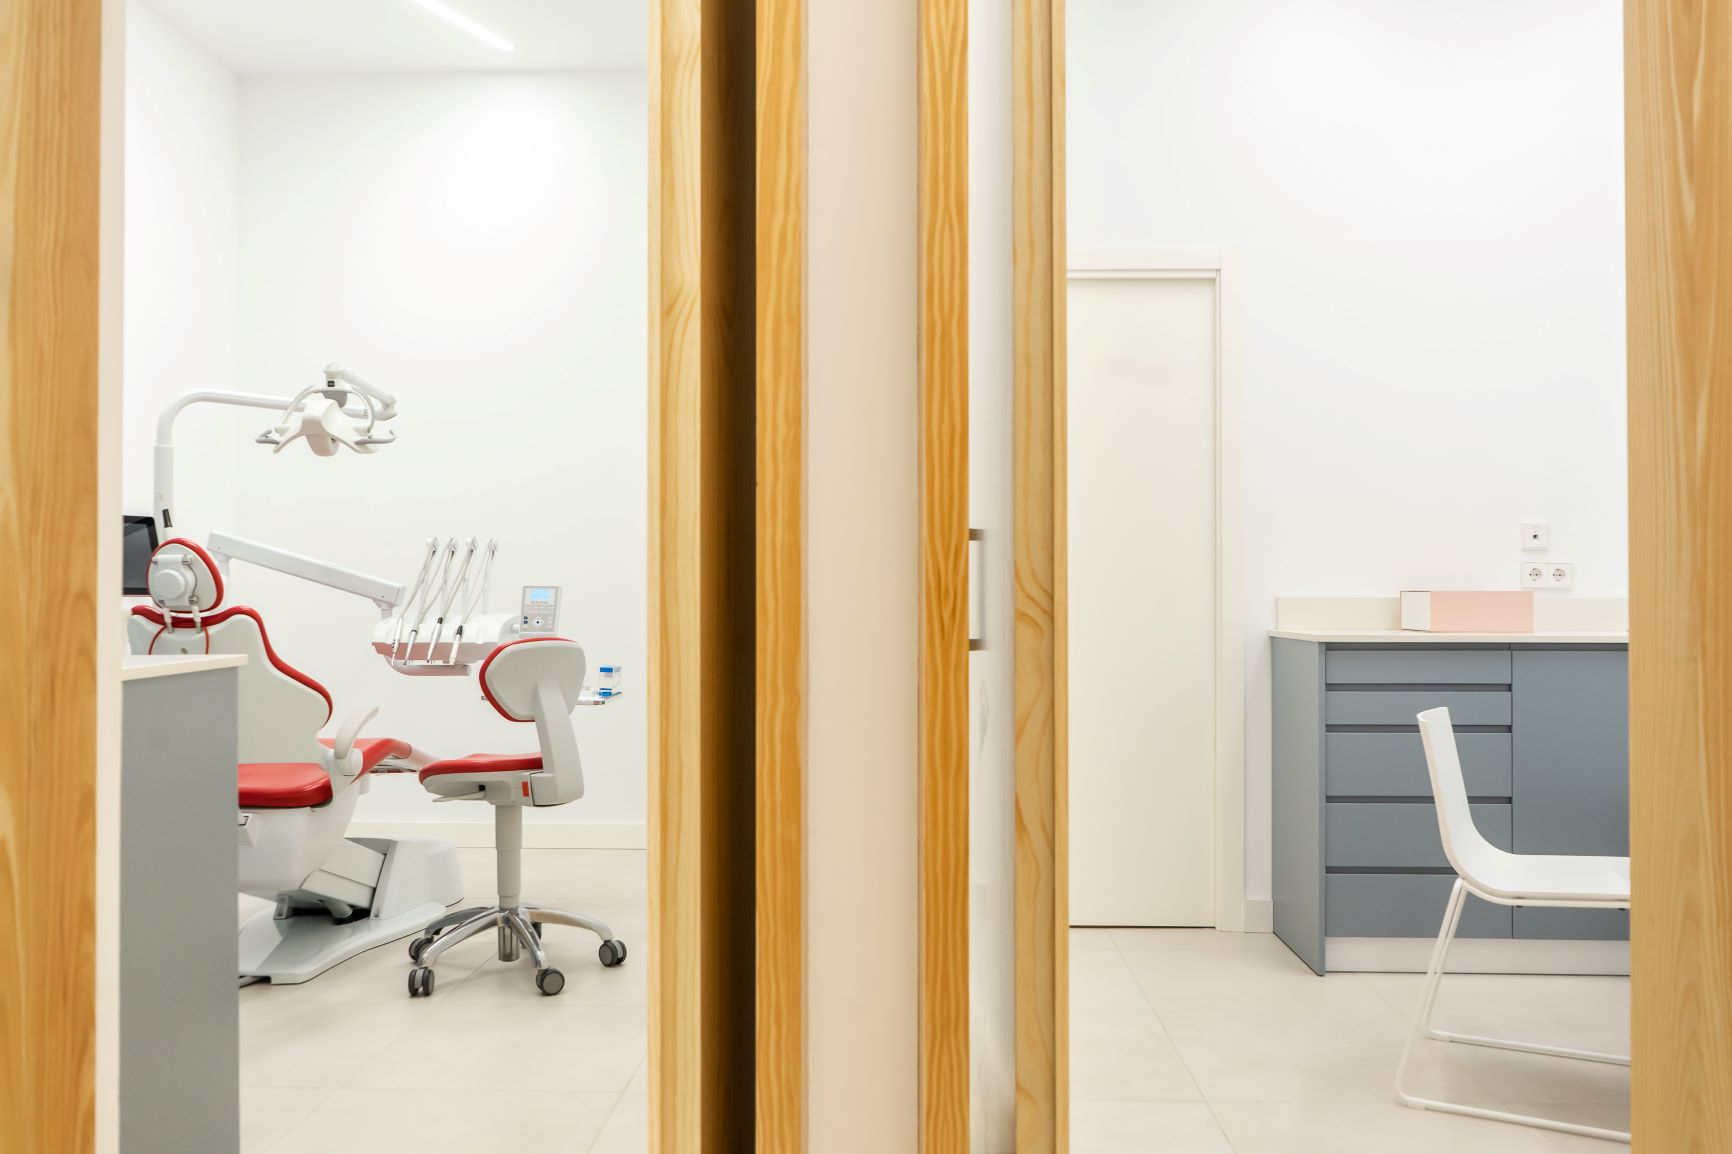 Impress abre en Palma de Mallorca su cuarta clínica propia